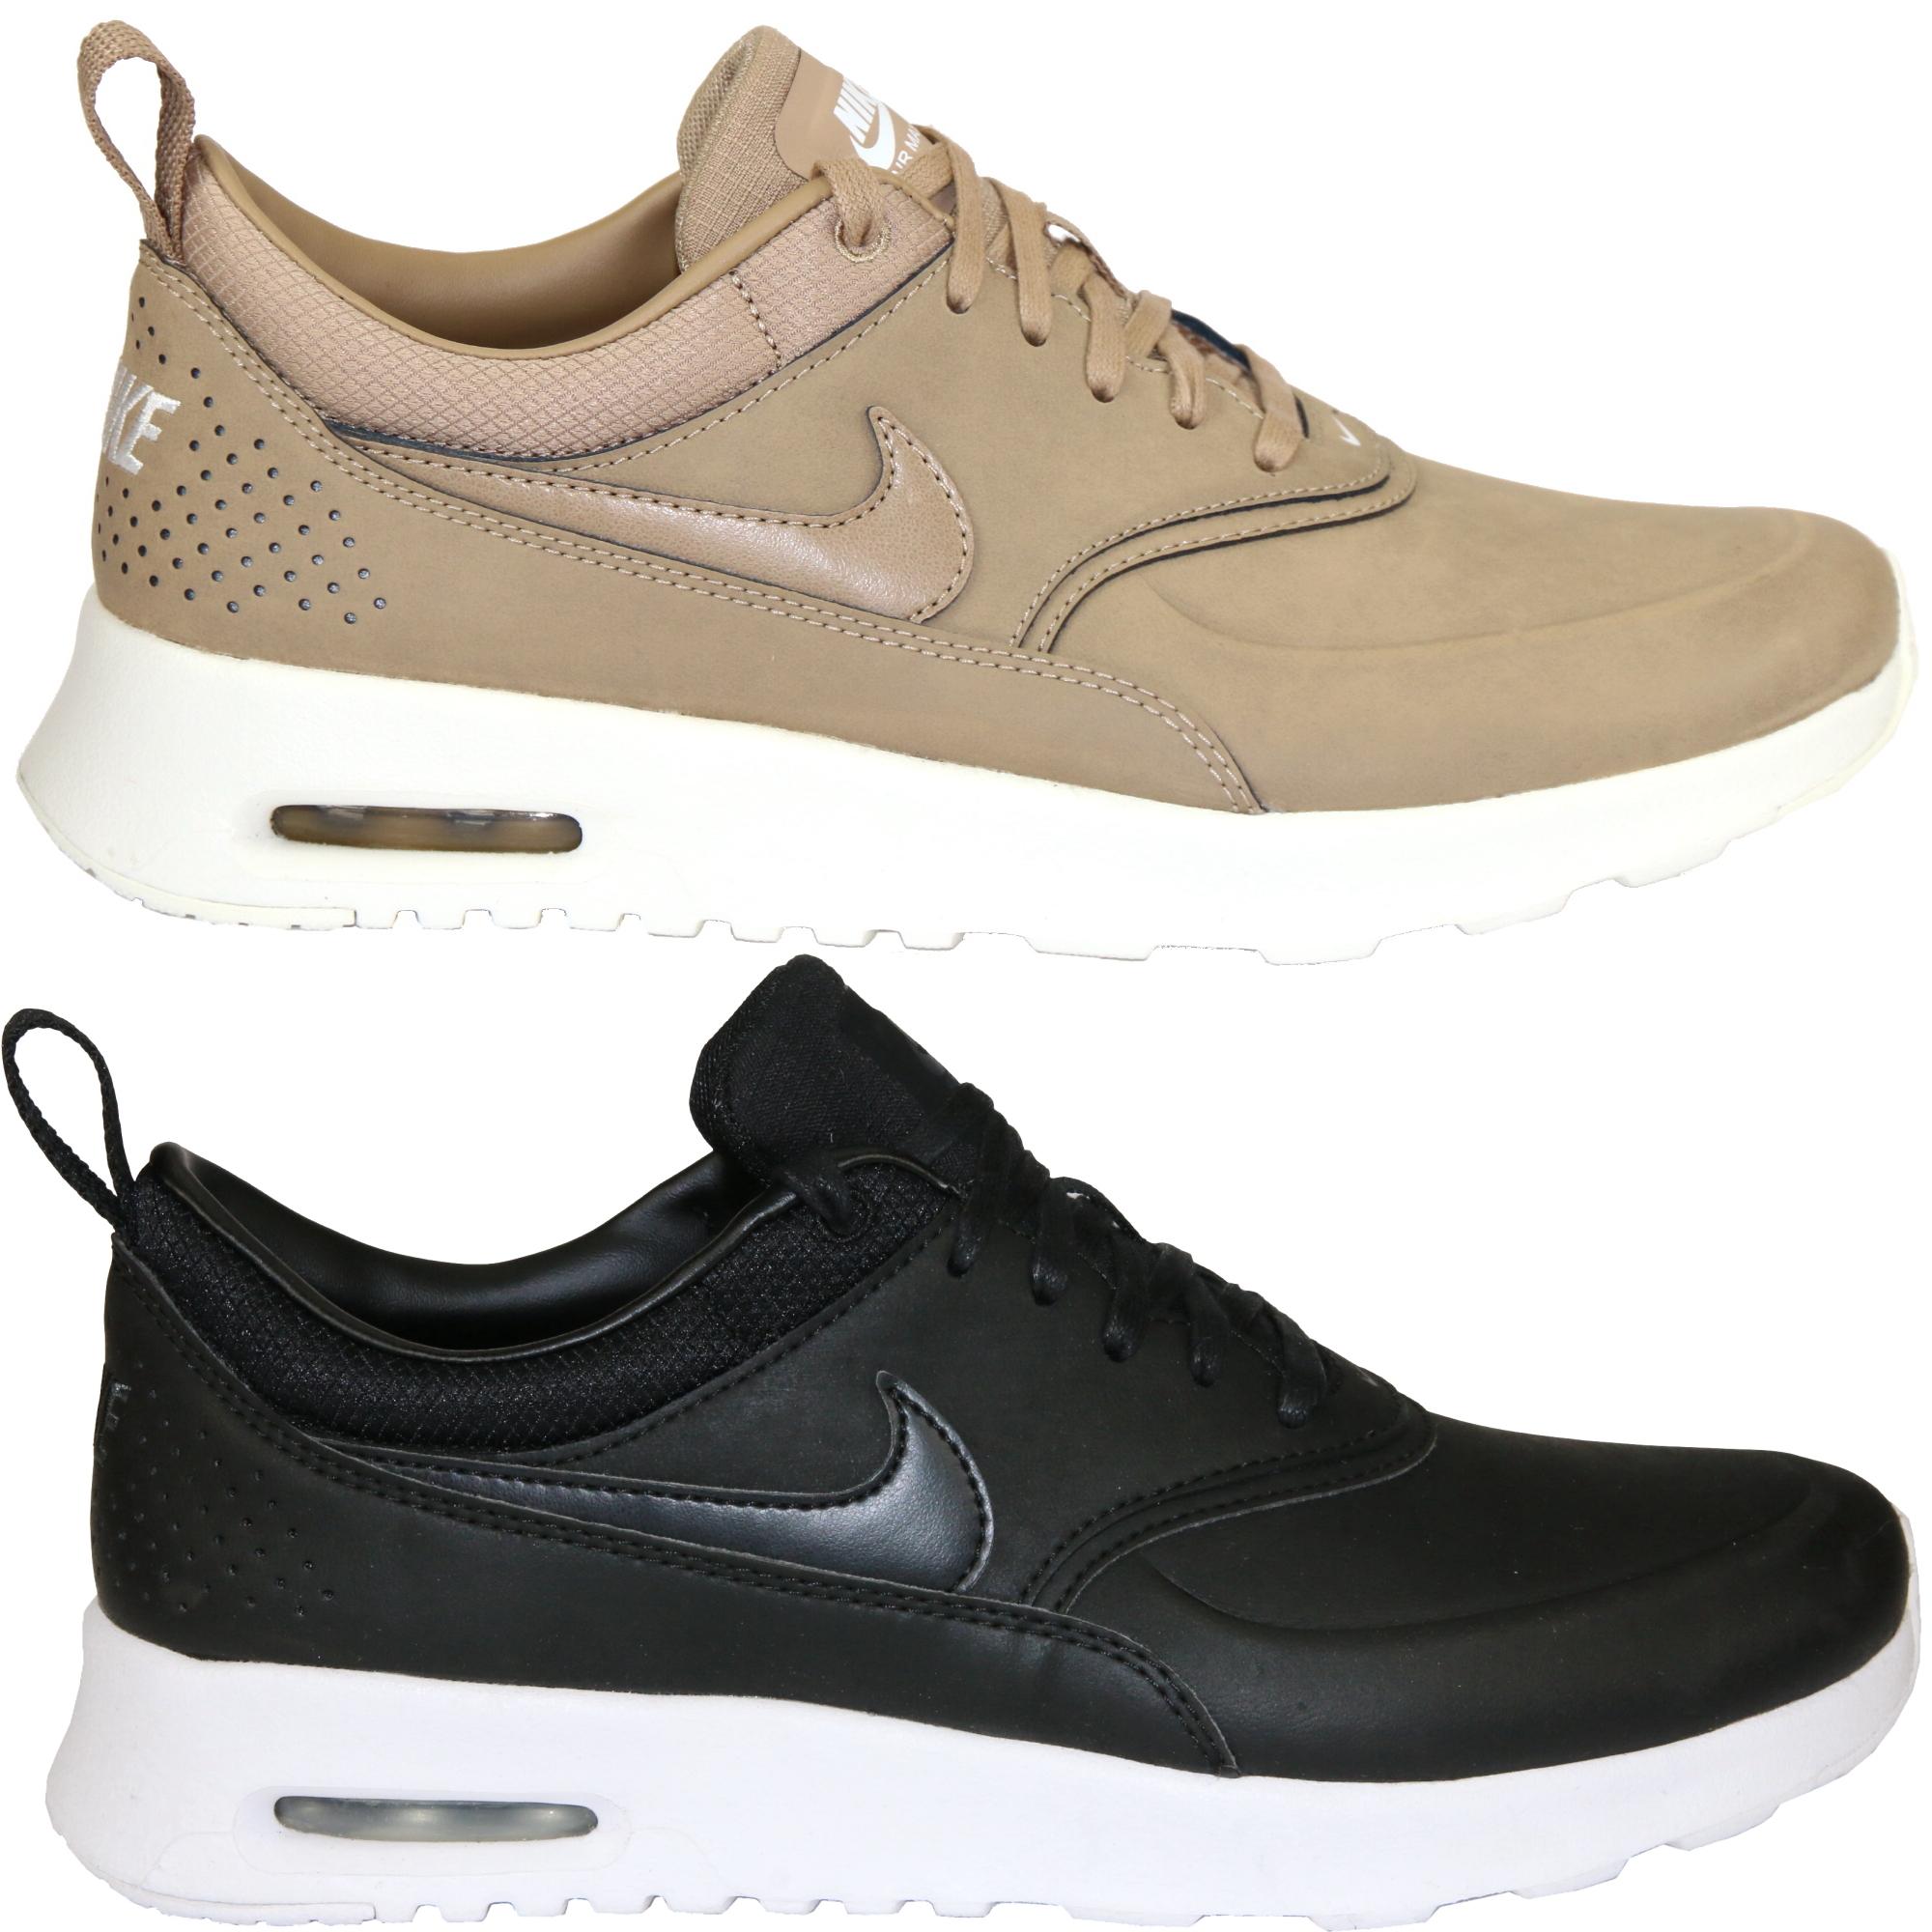 nike air max thea premium schuhe sneaker turnschuhe leder. Black Bedroom Furniture Sets. Home Design Ideas